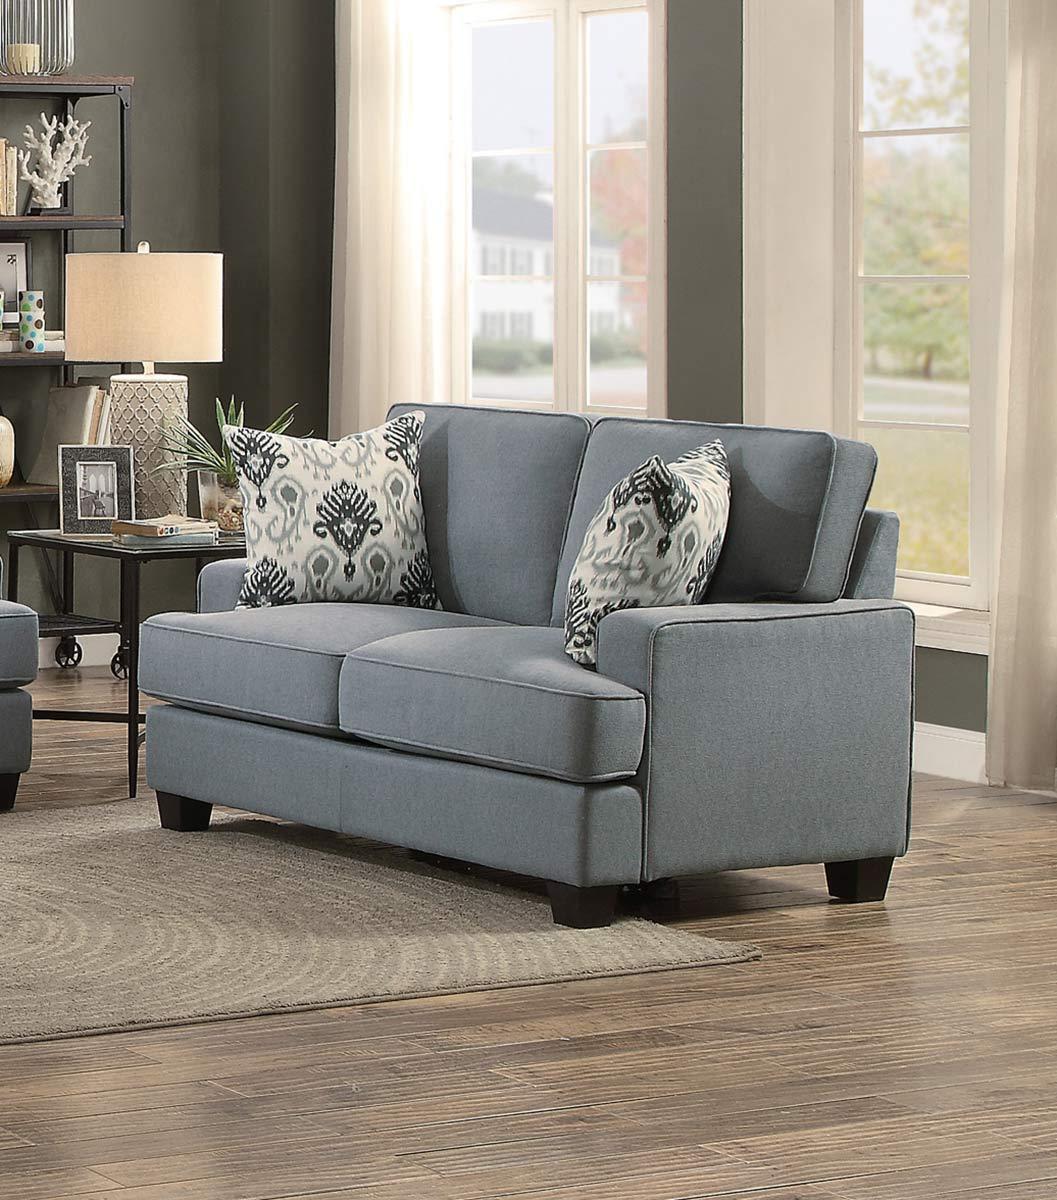 Homelegance Kenner Love Seat - Gray Fabric